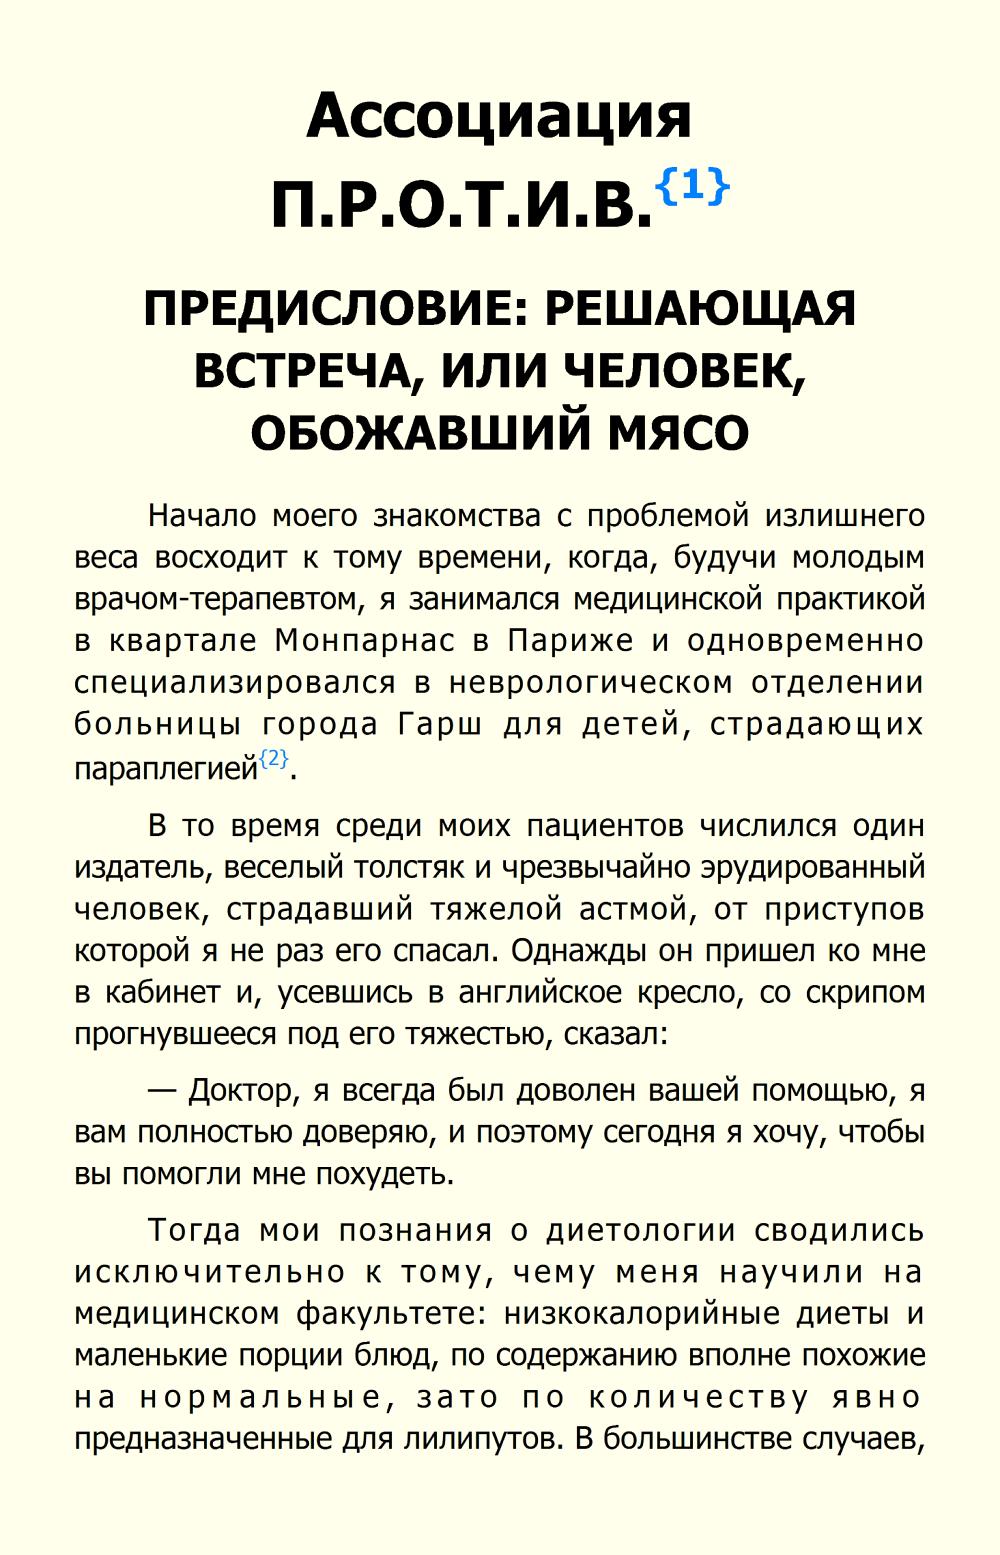 http://i6.imageban.ru/out/2014/01/21/aec123671f70b5b6098091f677ad7b5b.jpg